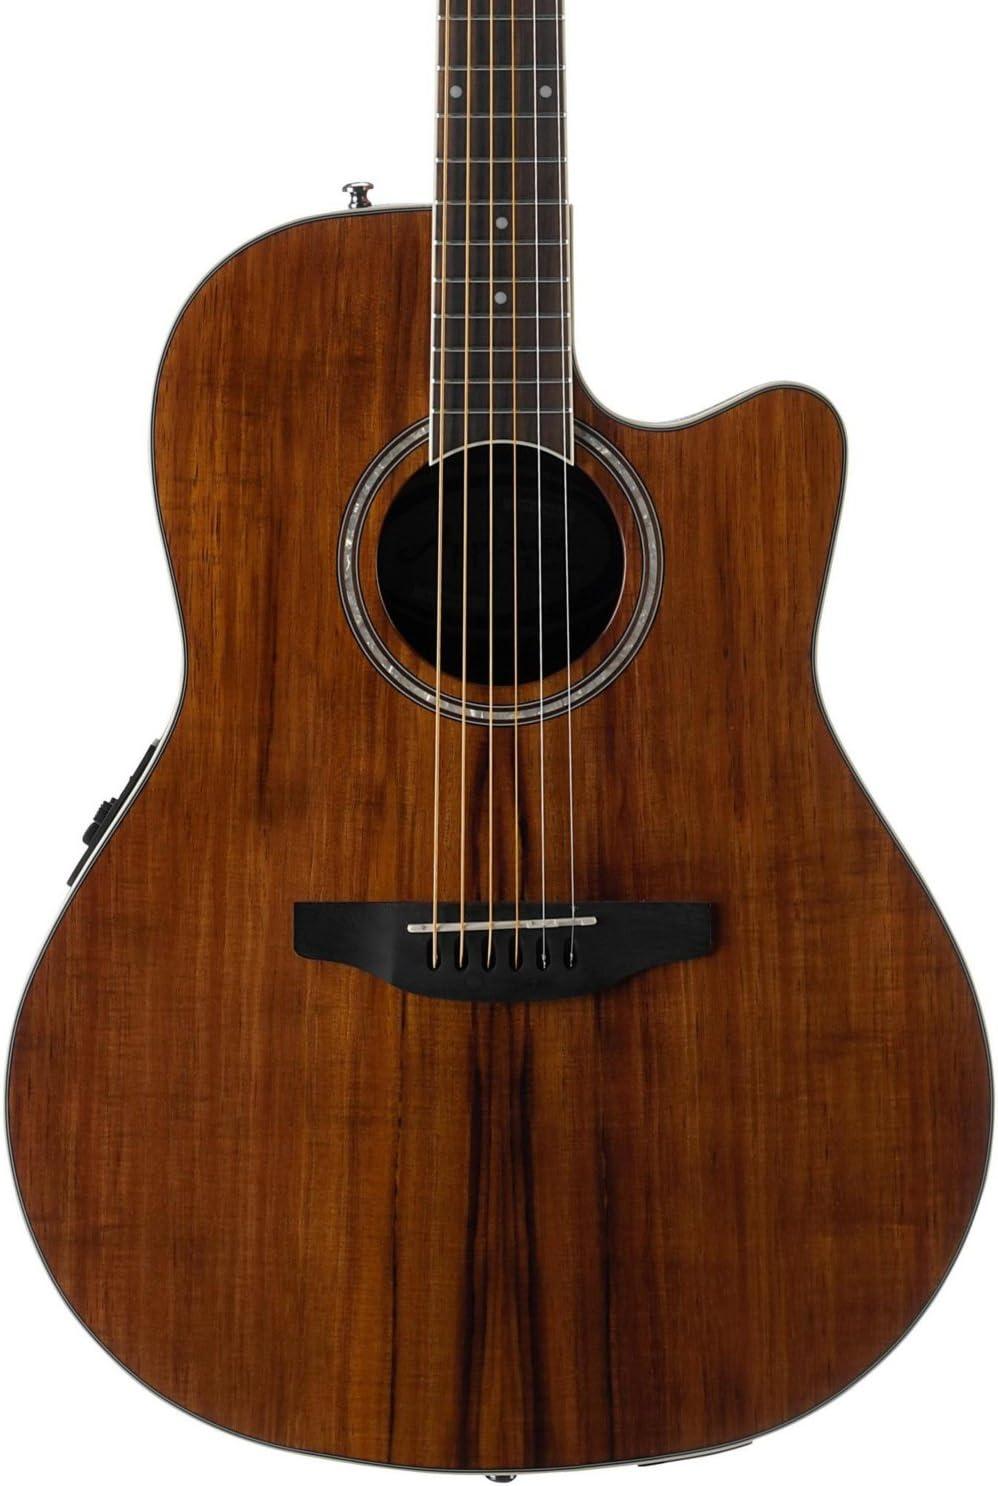 Ovation Applause Guitarra Electro-Acústica Mid Cutaway AB24IIP-KOA